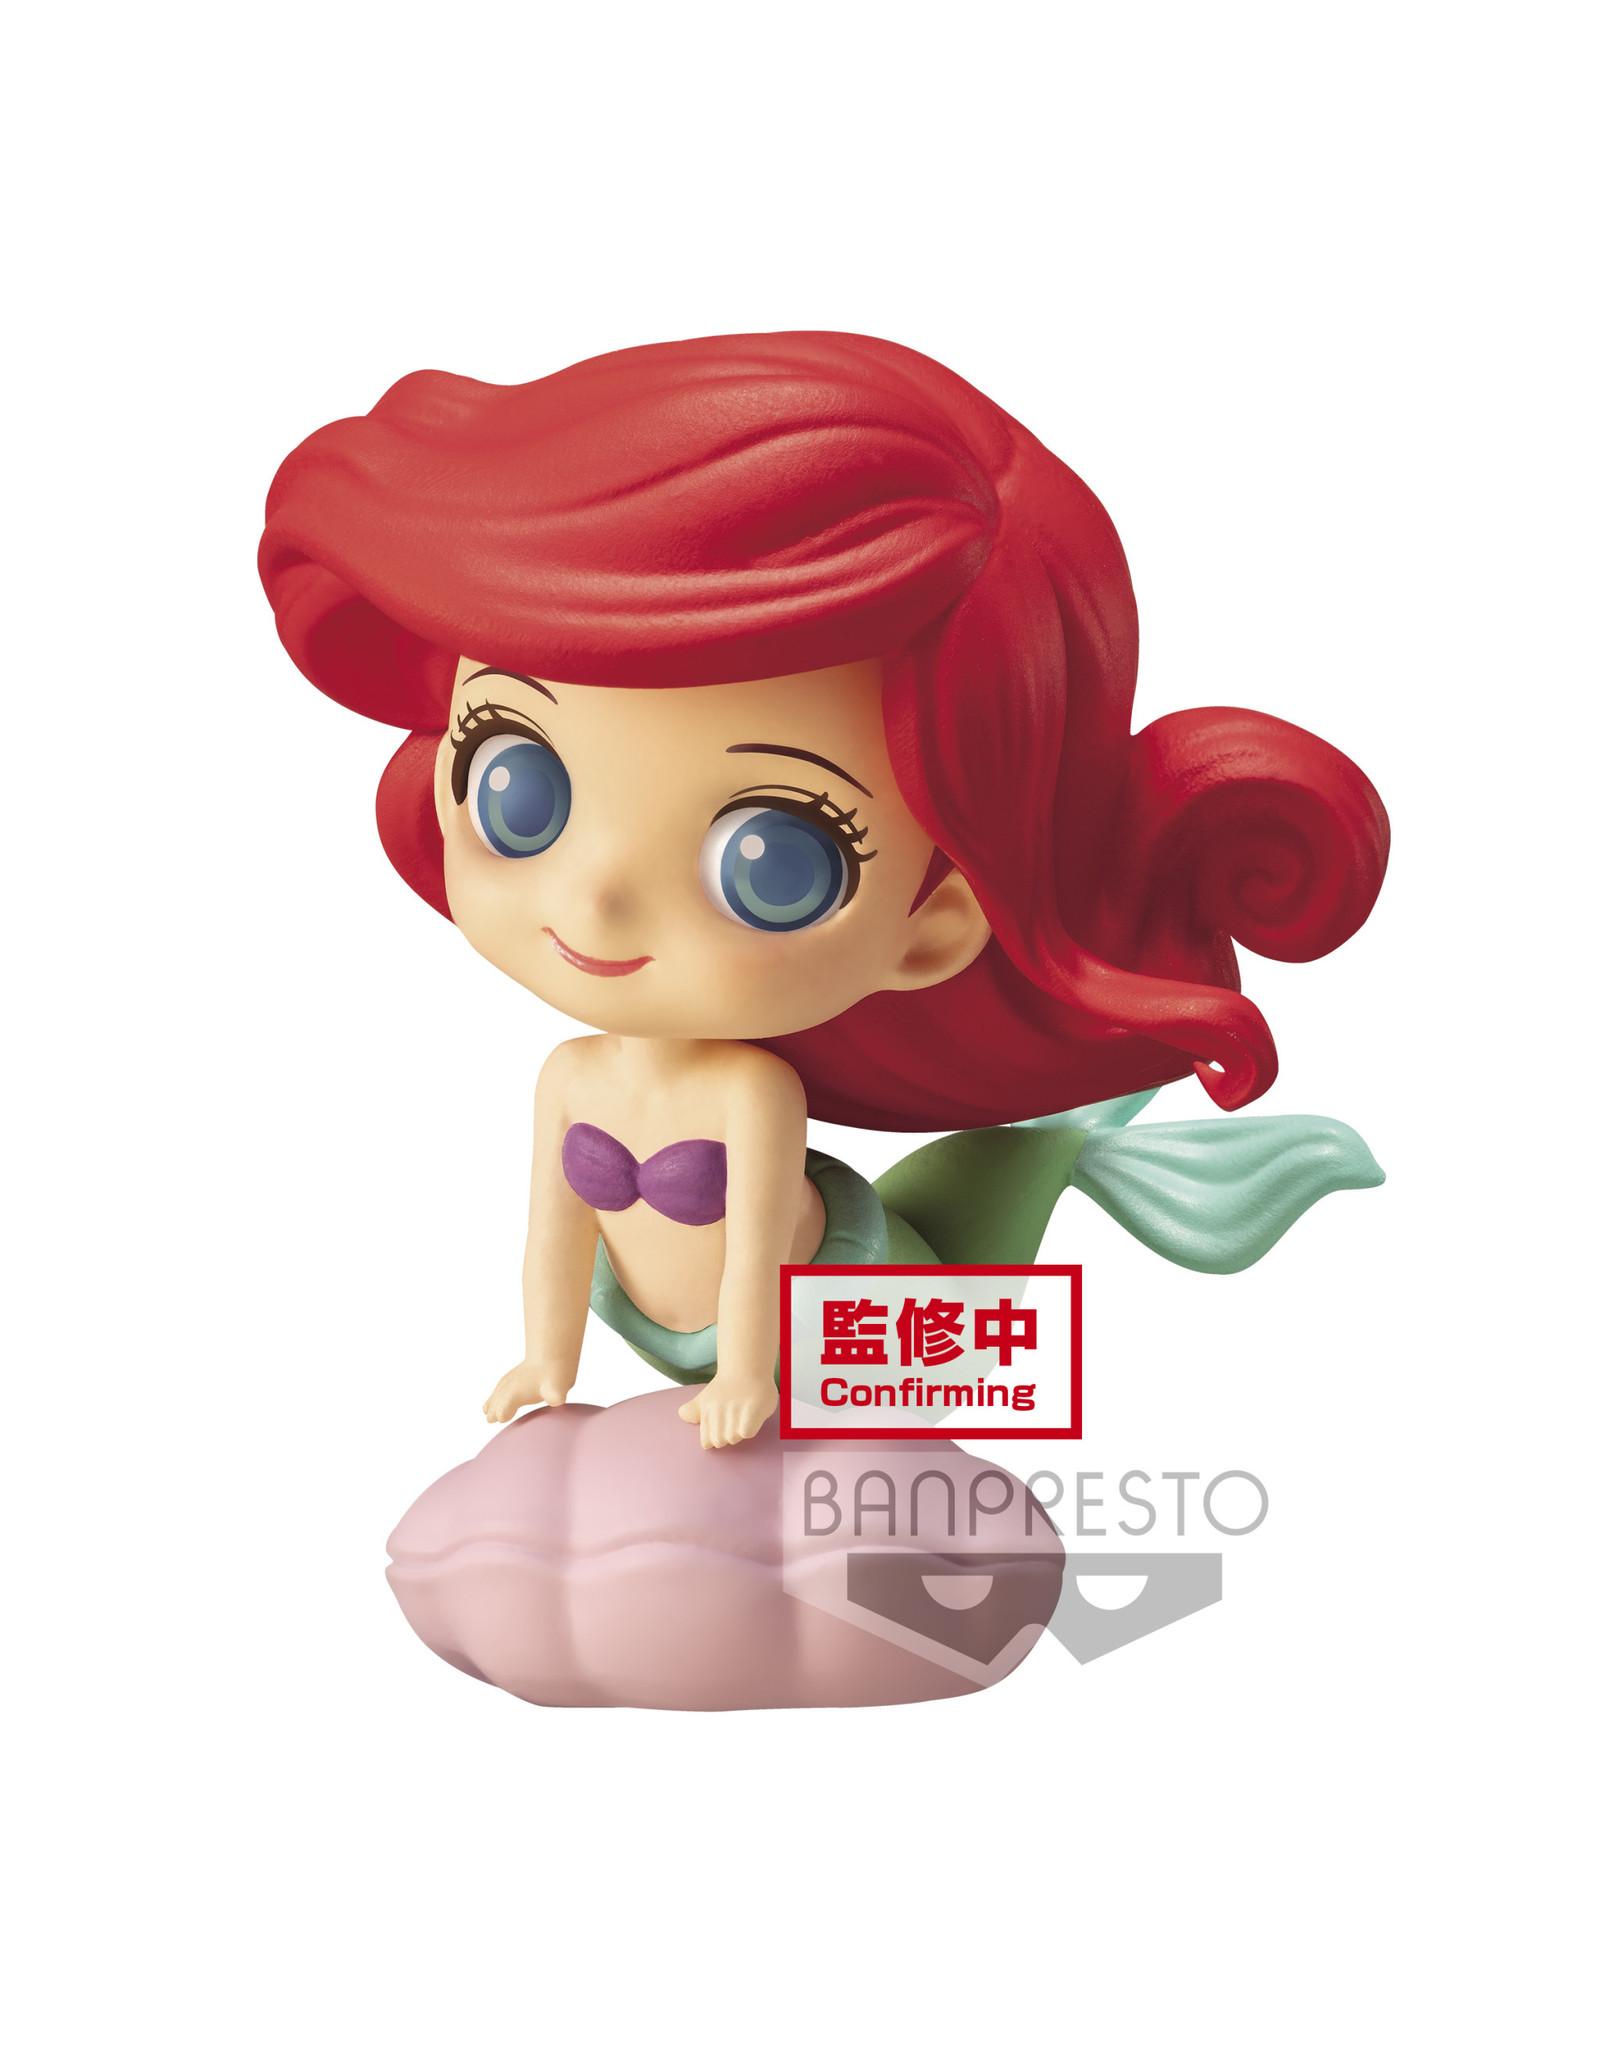 Banpresto DISNEY Q Posket Sweetiny Petit Figure  6cm - Ariel vol.1